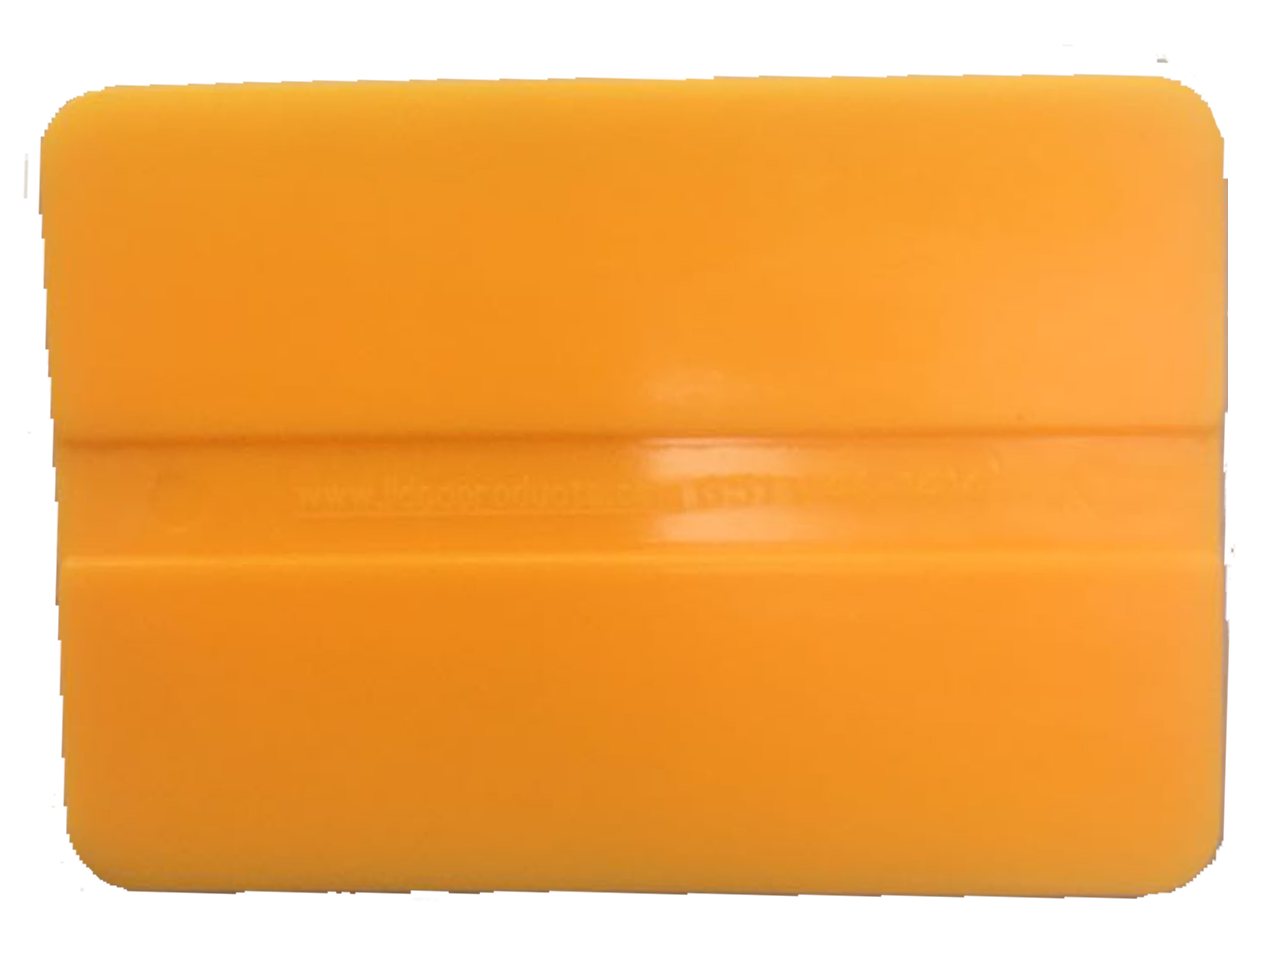 Película Profissional de Controle Solar  (1,52m X 30m) TLV 5, 20, 35 e 50. Cores Disponíveis: Charcoal, Preto, Verde Oliva, Grafite.